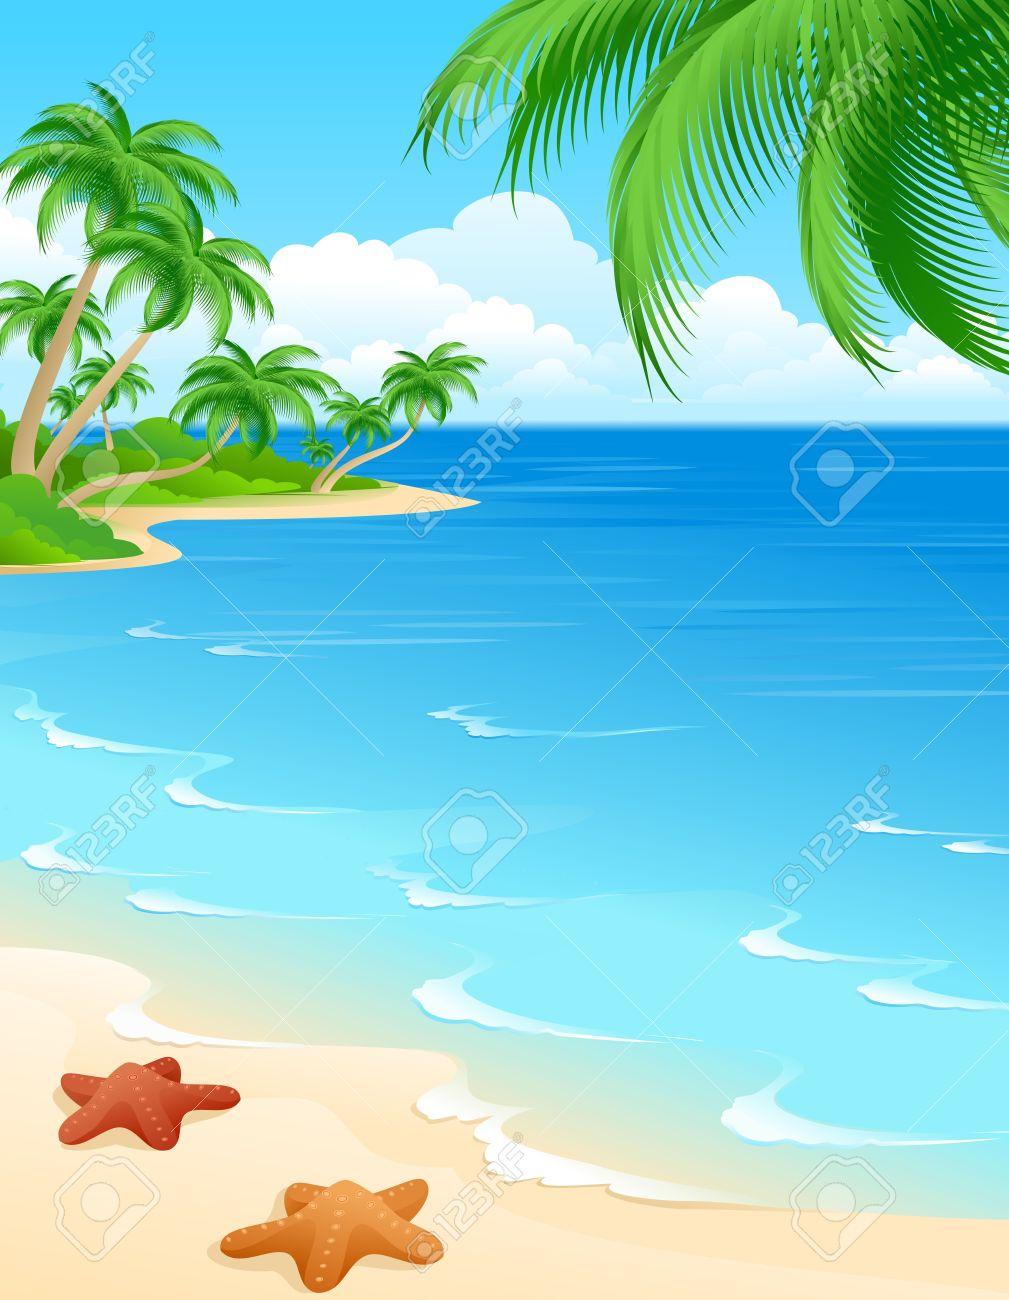 Tropical Beach Clipart 5 - 1009 X 1300 - Making-The-Web.com clipart transparent